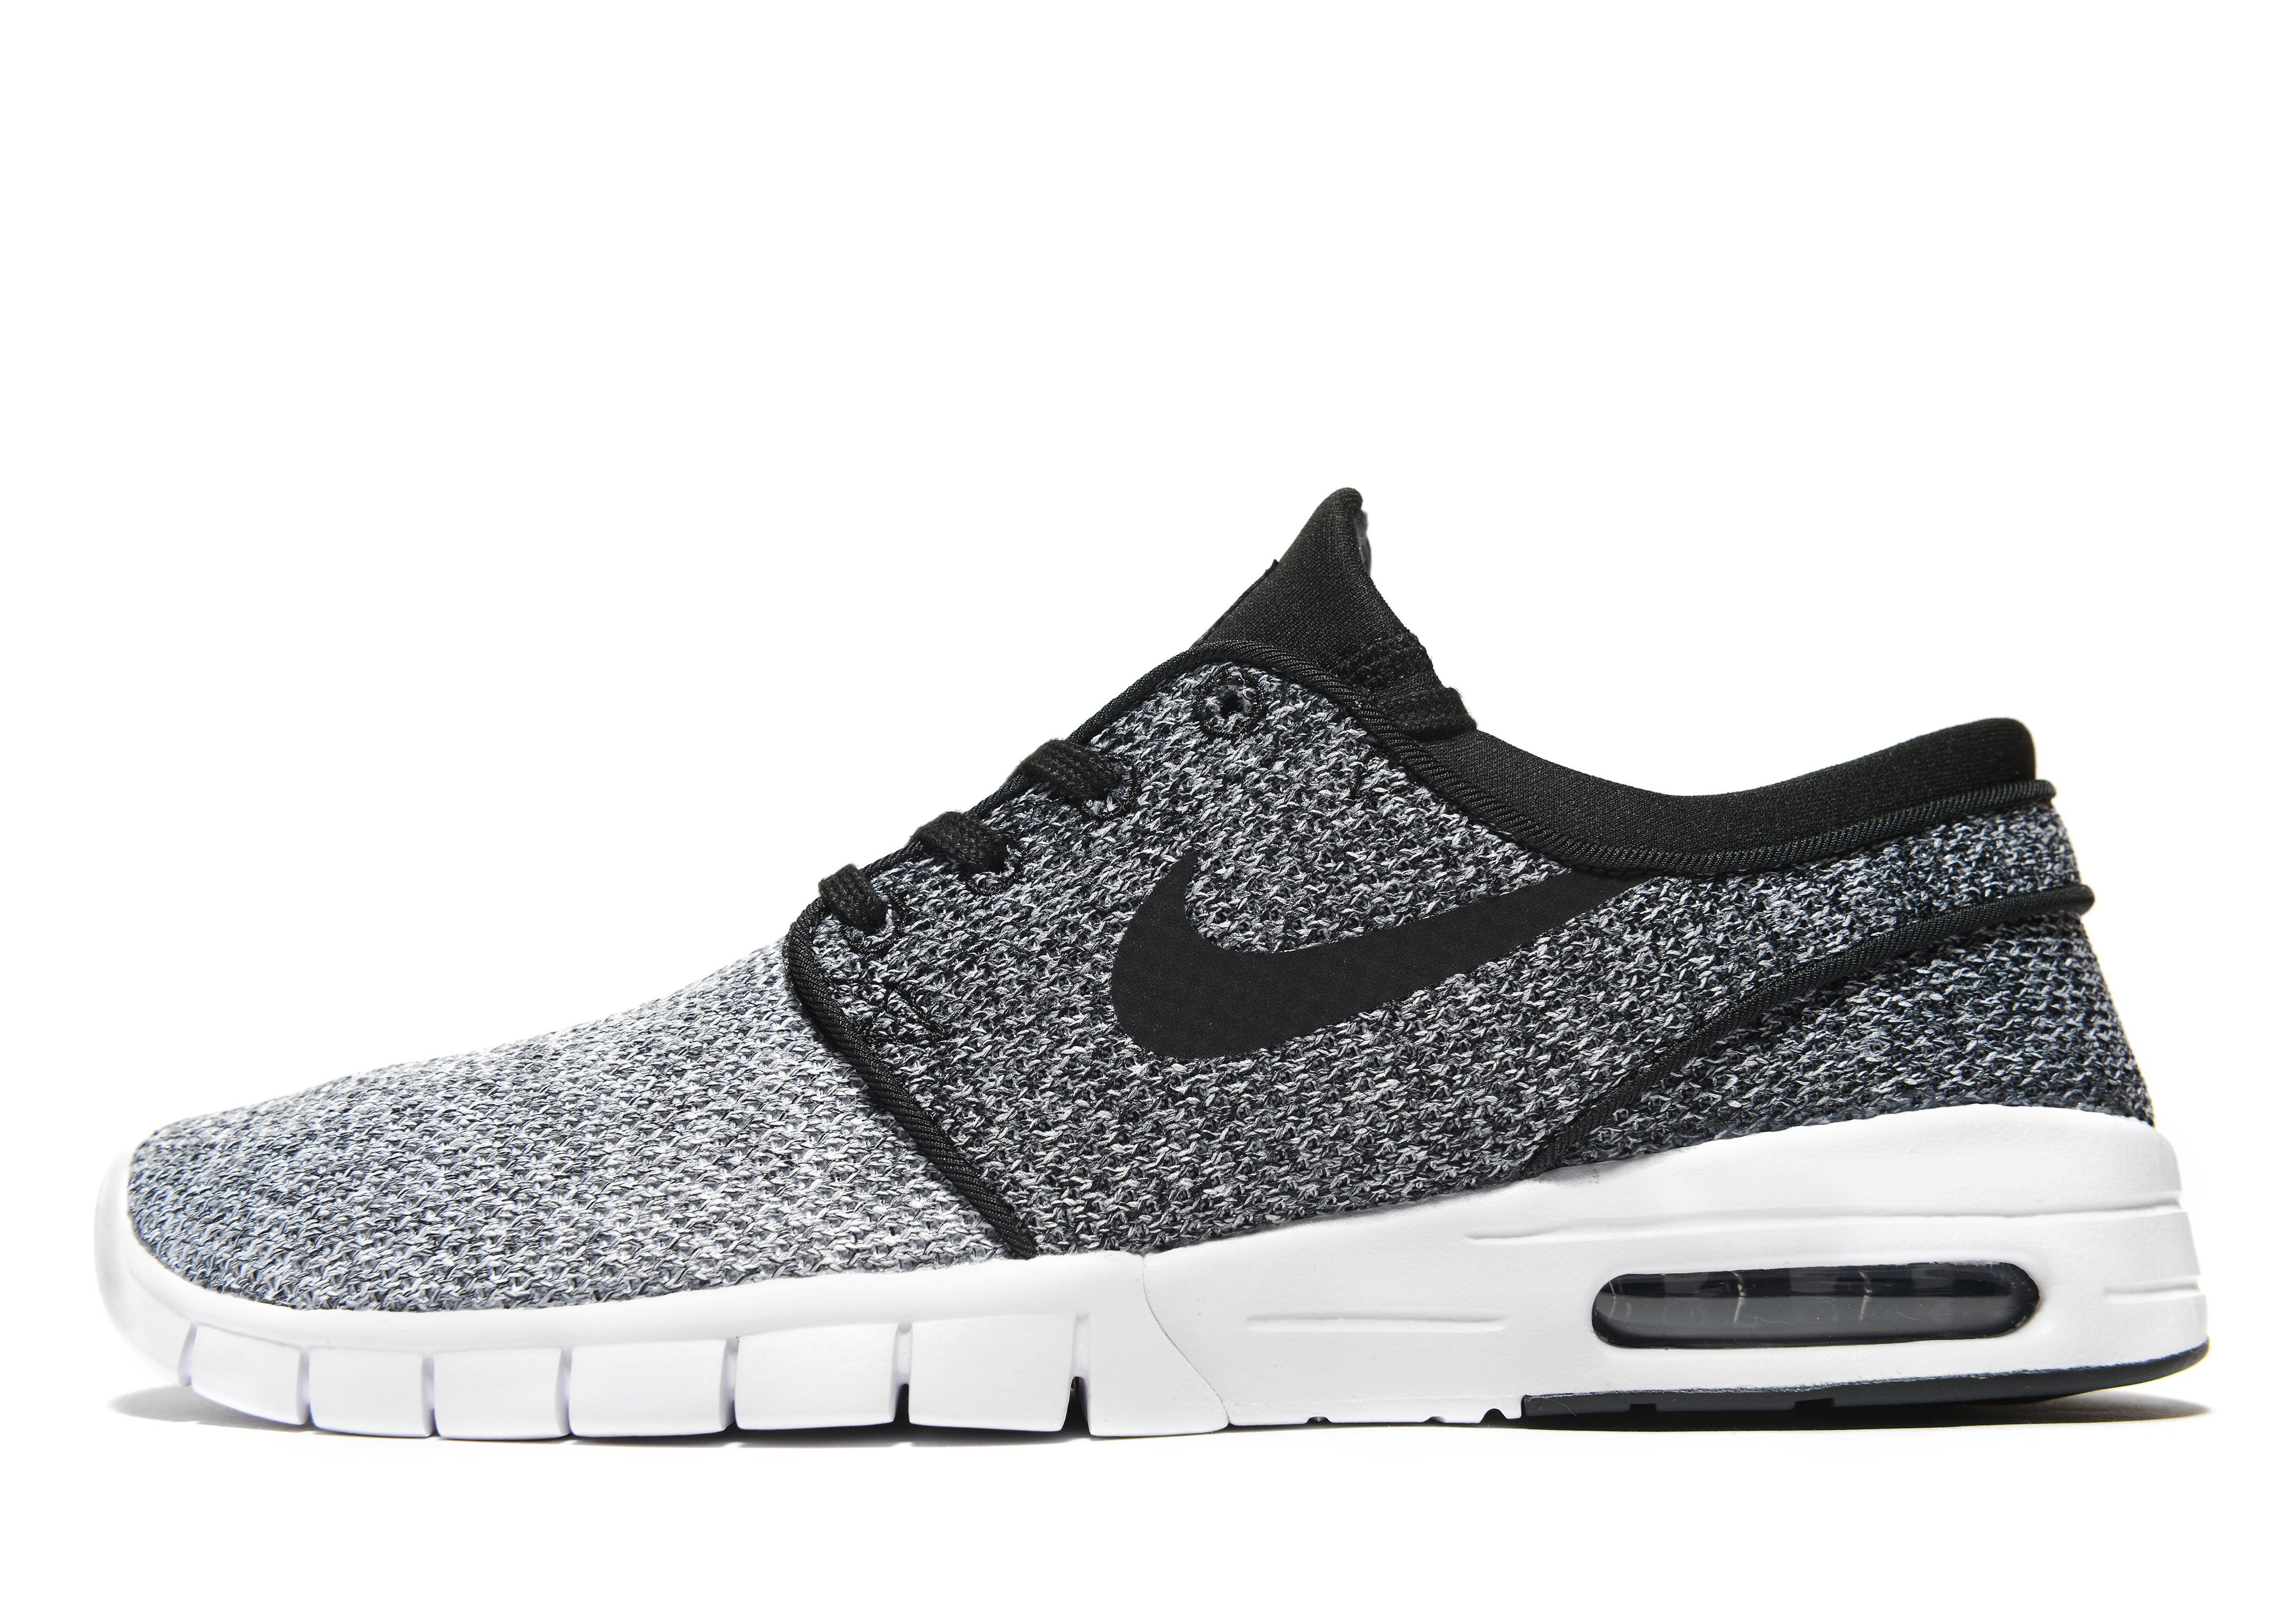 on sale Nike SB Stefan Janoski Max JD Sports - arcsouthington.org a8e84af6a